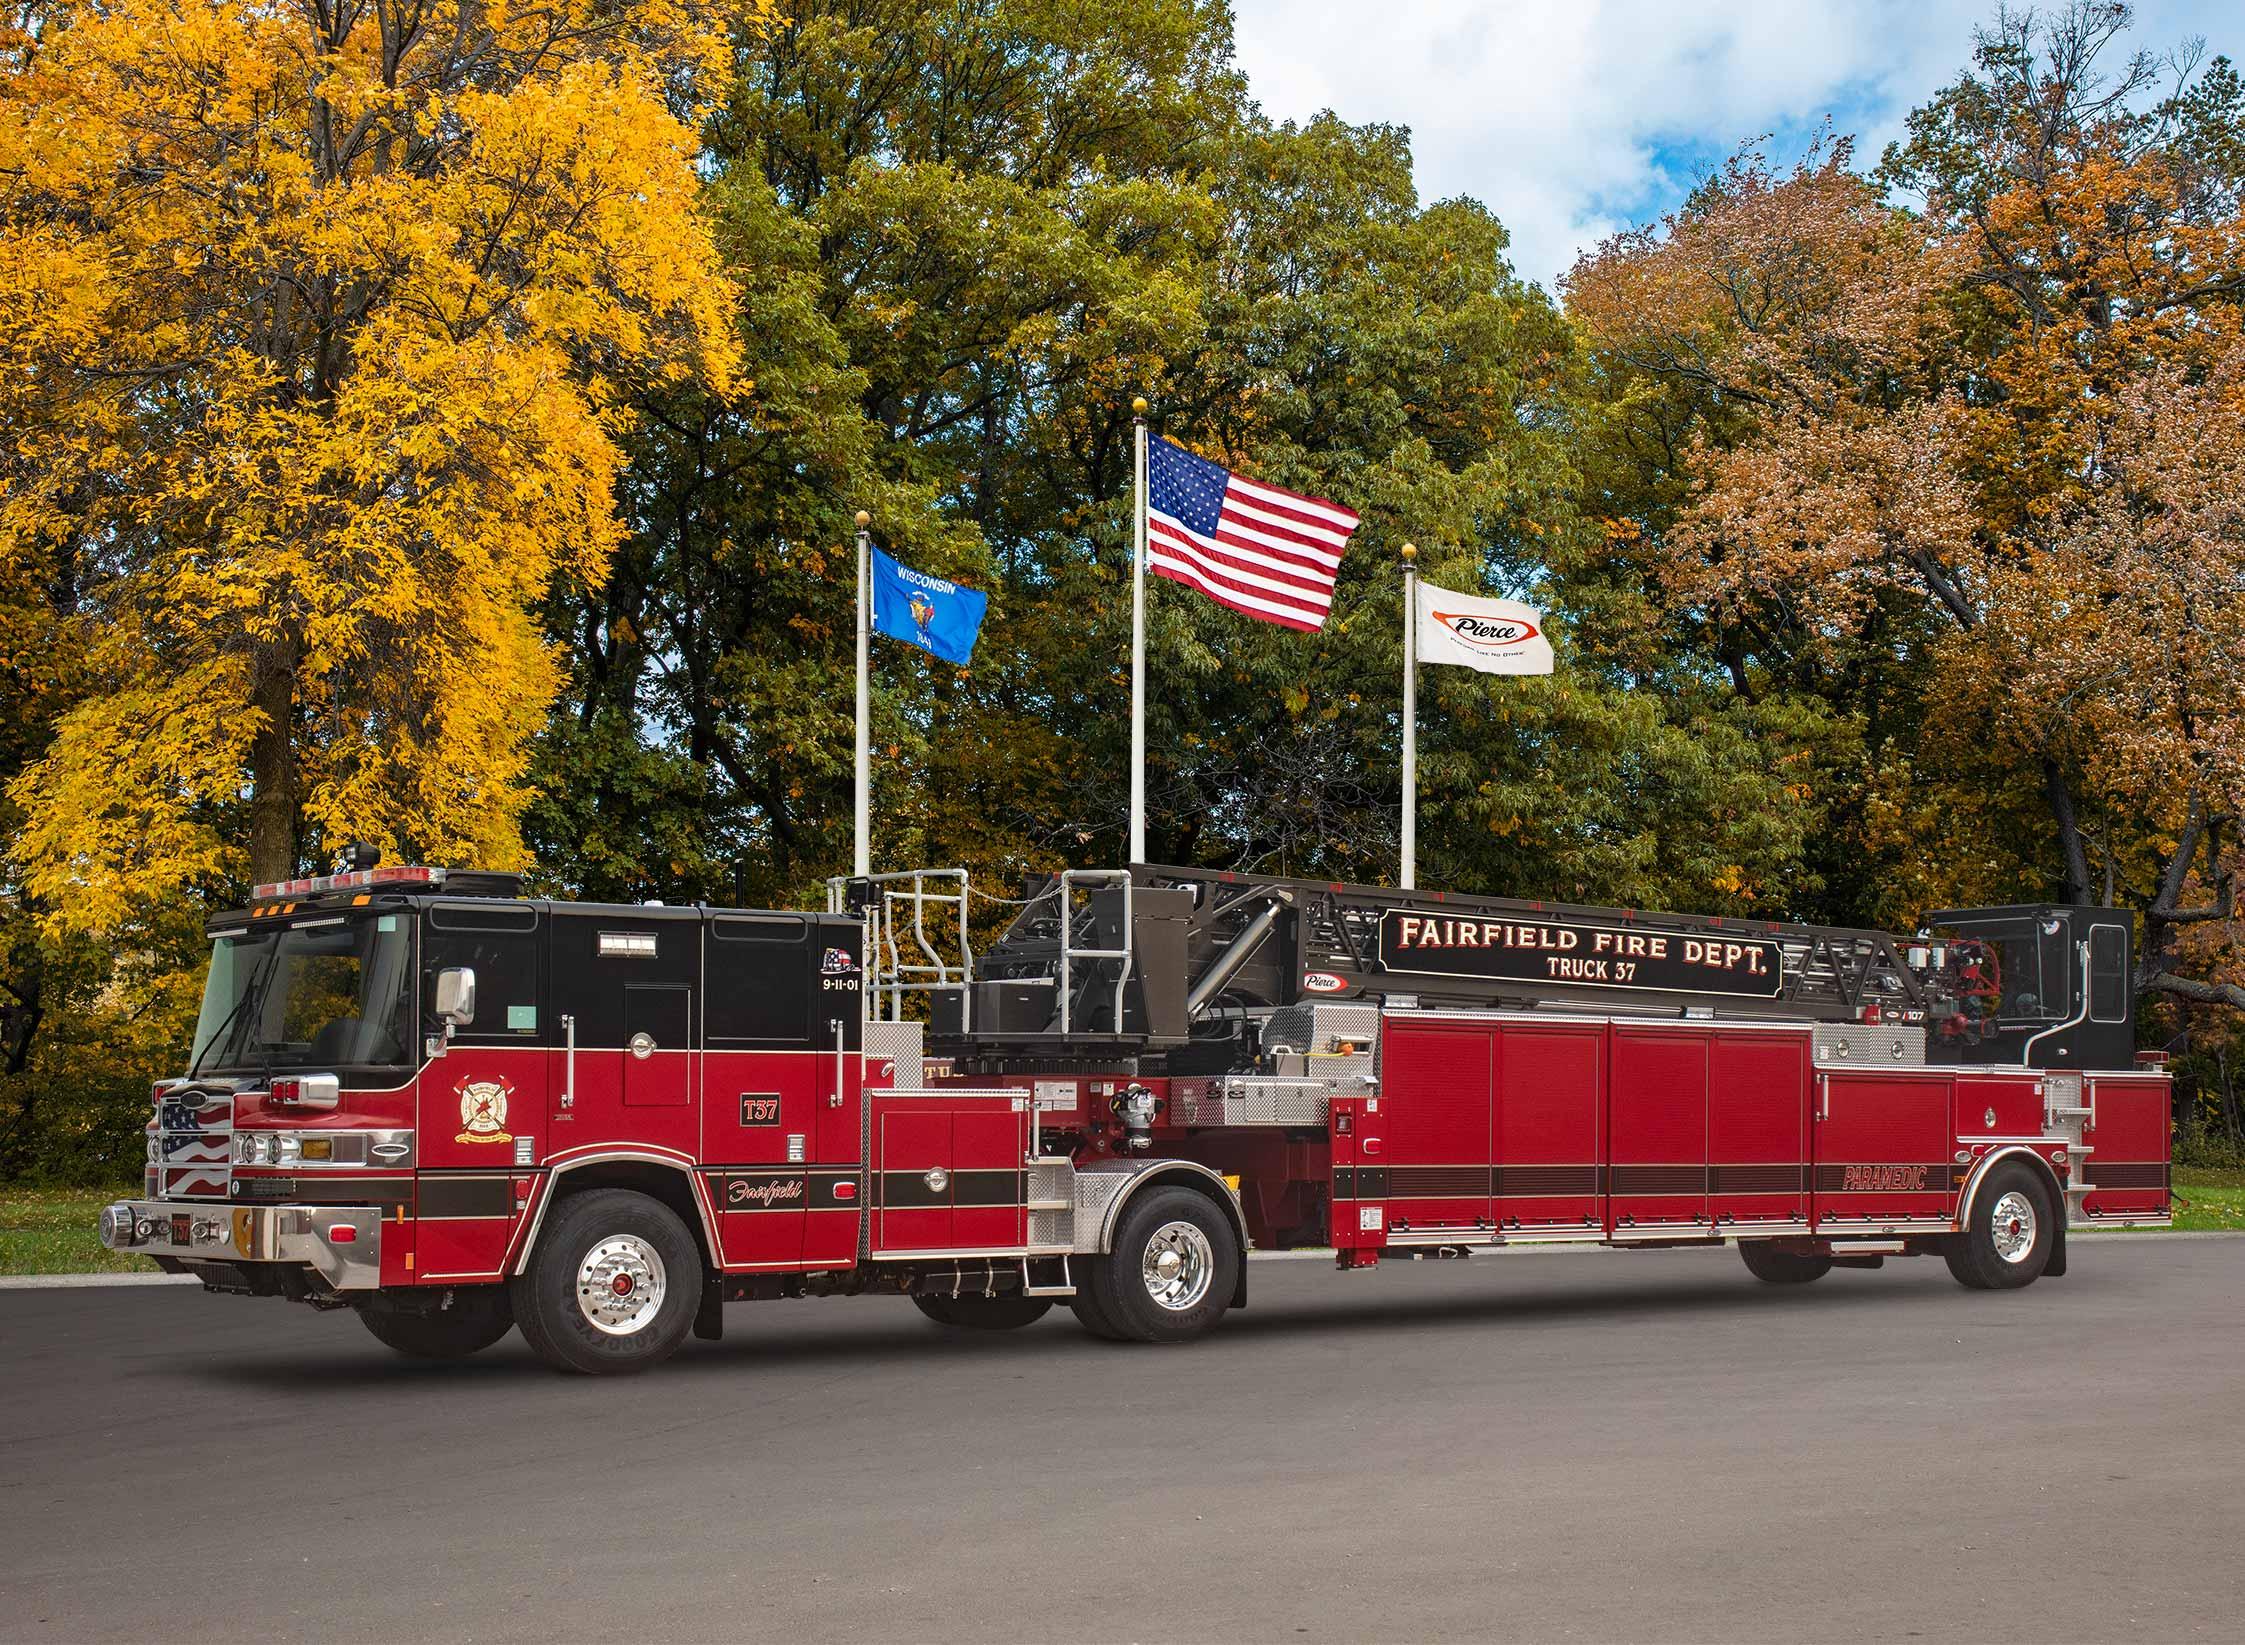 Fairfield Fire Department - Aerial